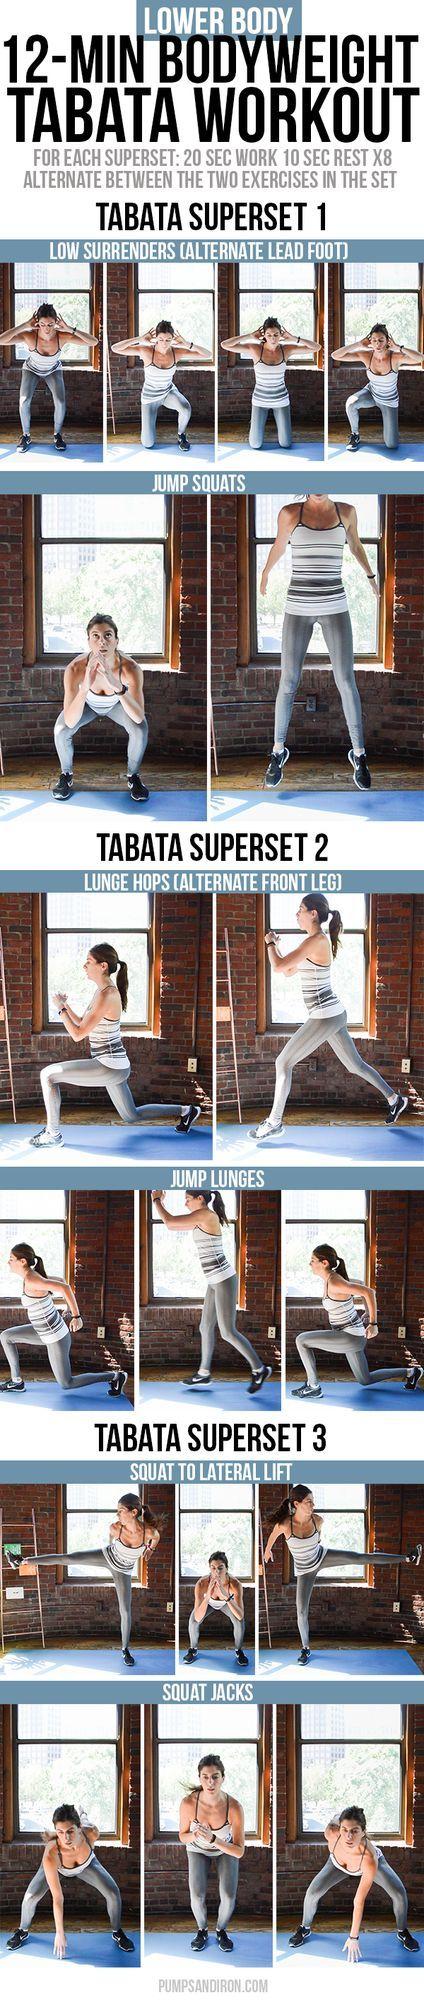 12-Minute Bodyweight Tabata Workout Series: Lower Body (Legs & Glutes) | Pumps & Iron | Bloglovin'